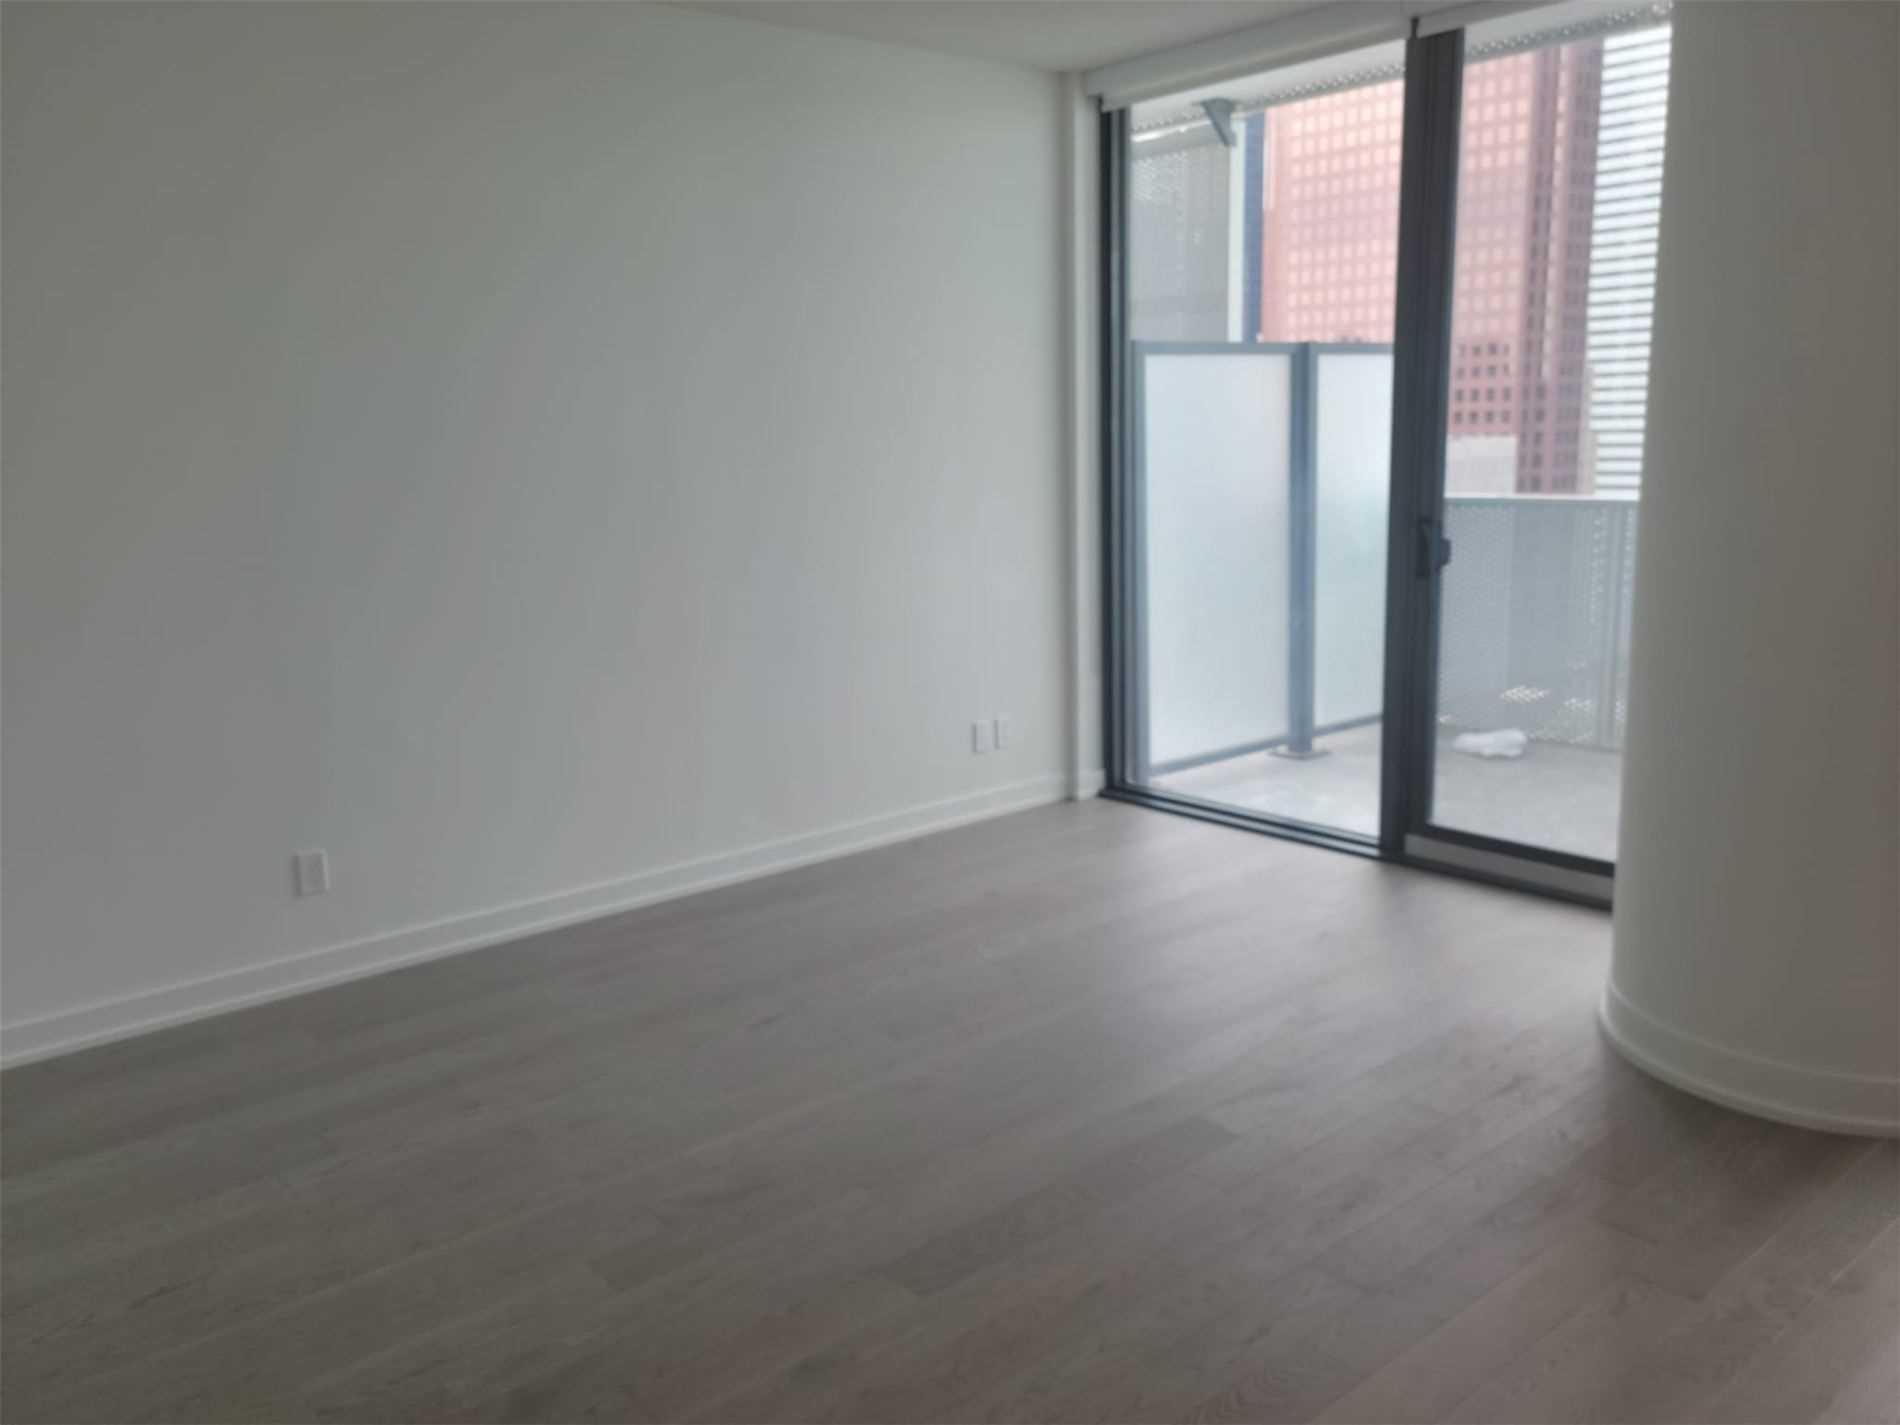 Condo Apt For Lease In Toronto , 1 Bedroom Bedrooms, ,1 BathroomBathrooms,Condo Apt,For Lease,2406,Richmond